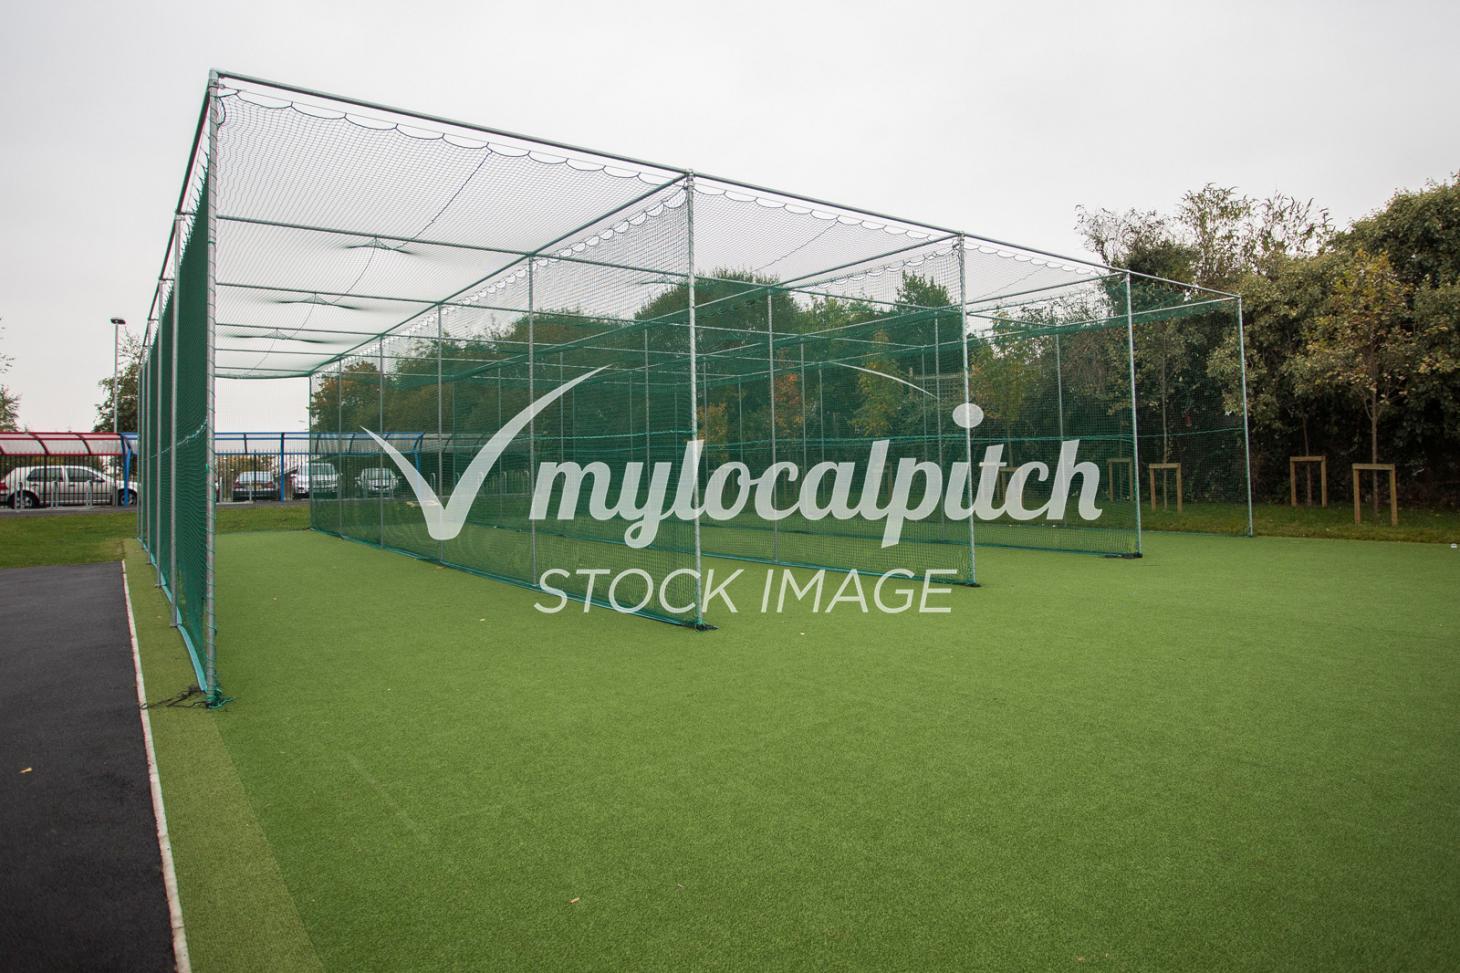 Edward Alleyn Club Nets | Artificial cricket facilities